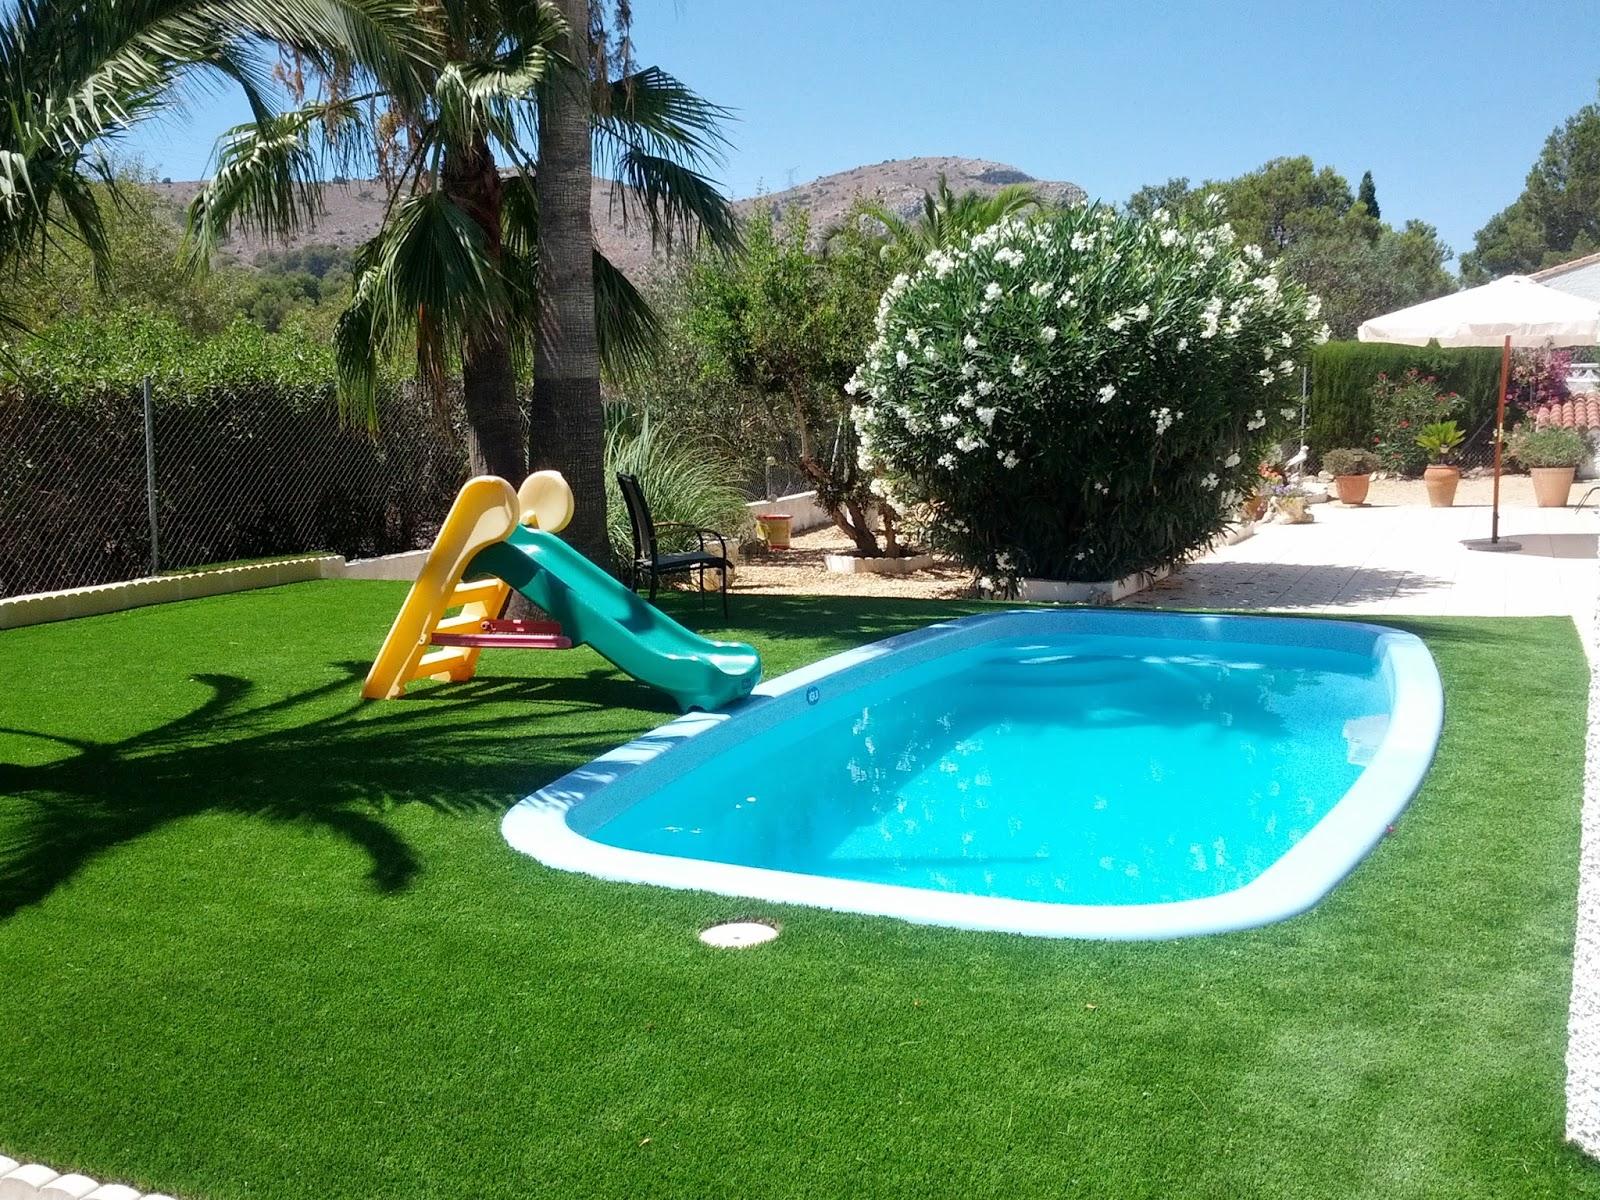 Piscinas europa novembro 2014 for Jardines con piscinas desmontables